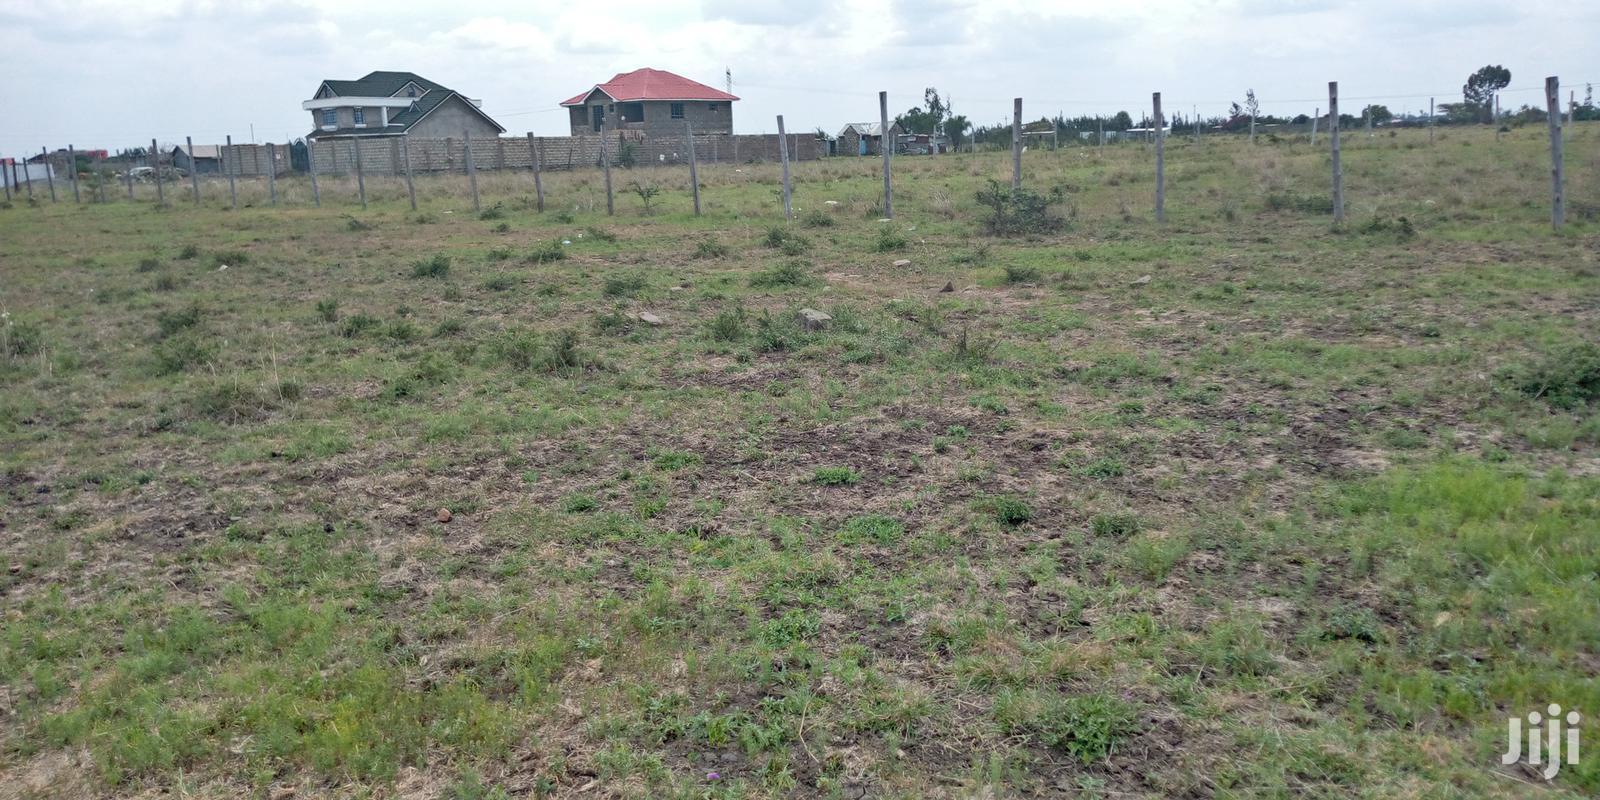 1/8 Acre For Sale   Land & Plots For Sale for sale in Juja, Kiambu, Kenya